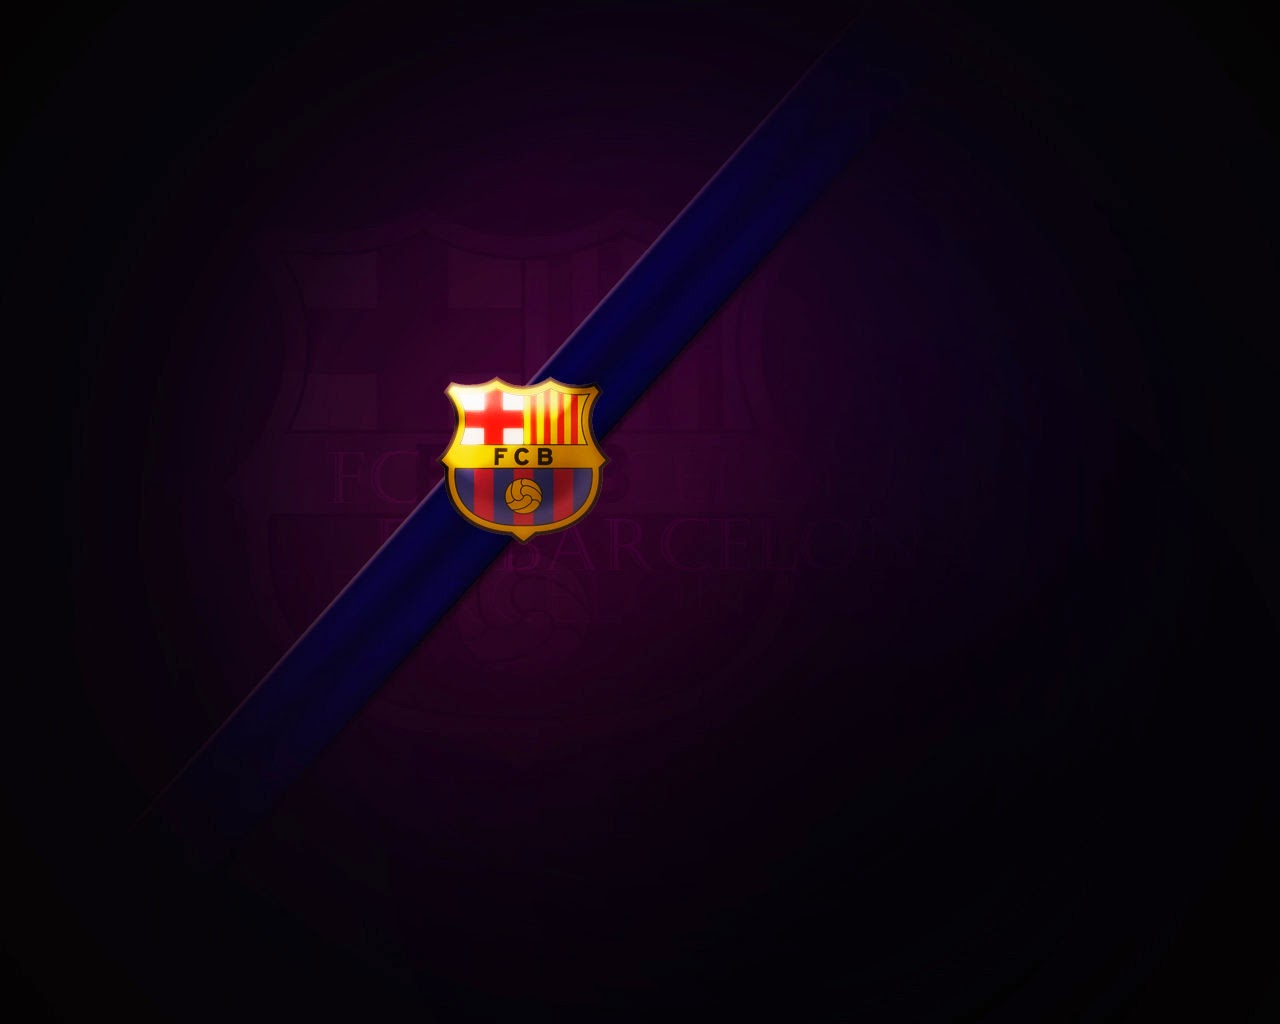 Barcelona Football Club Wallpaper - Football Wallpaper HD